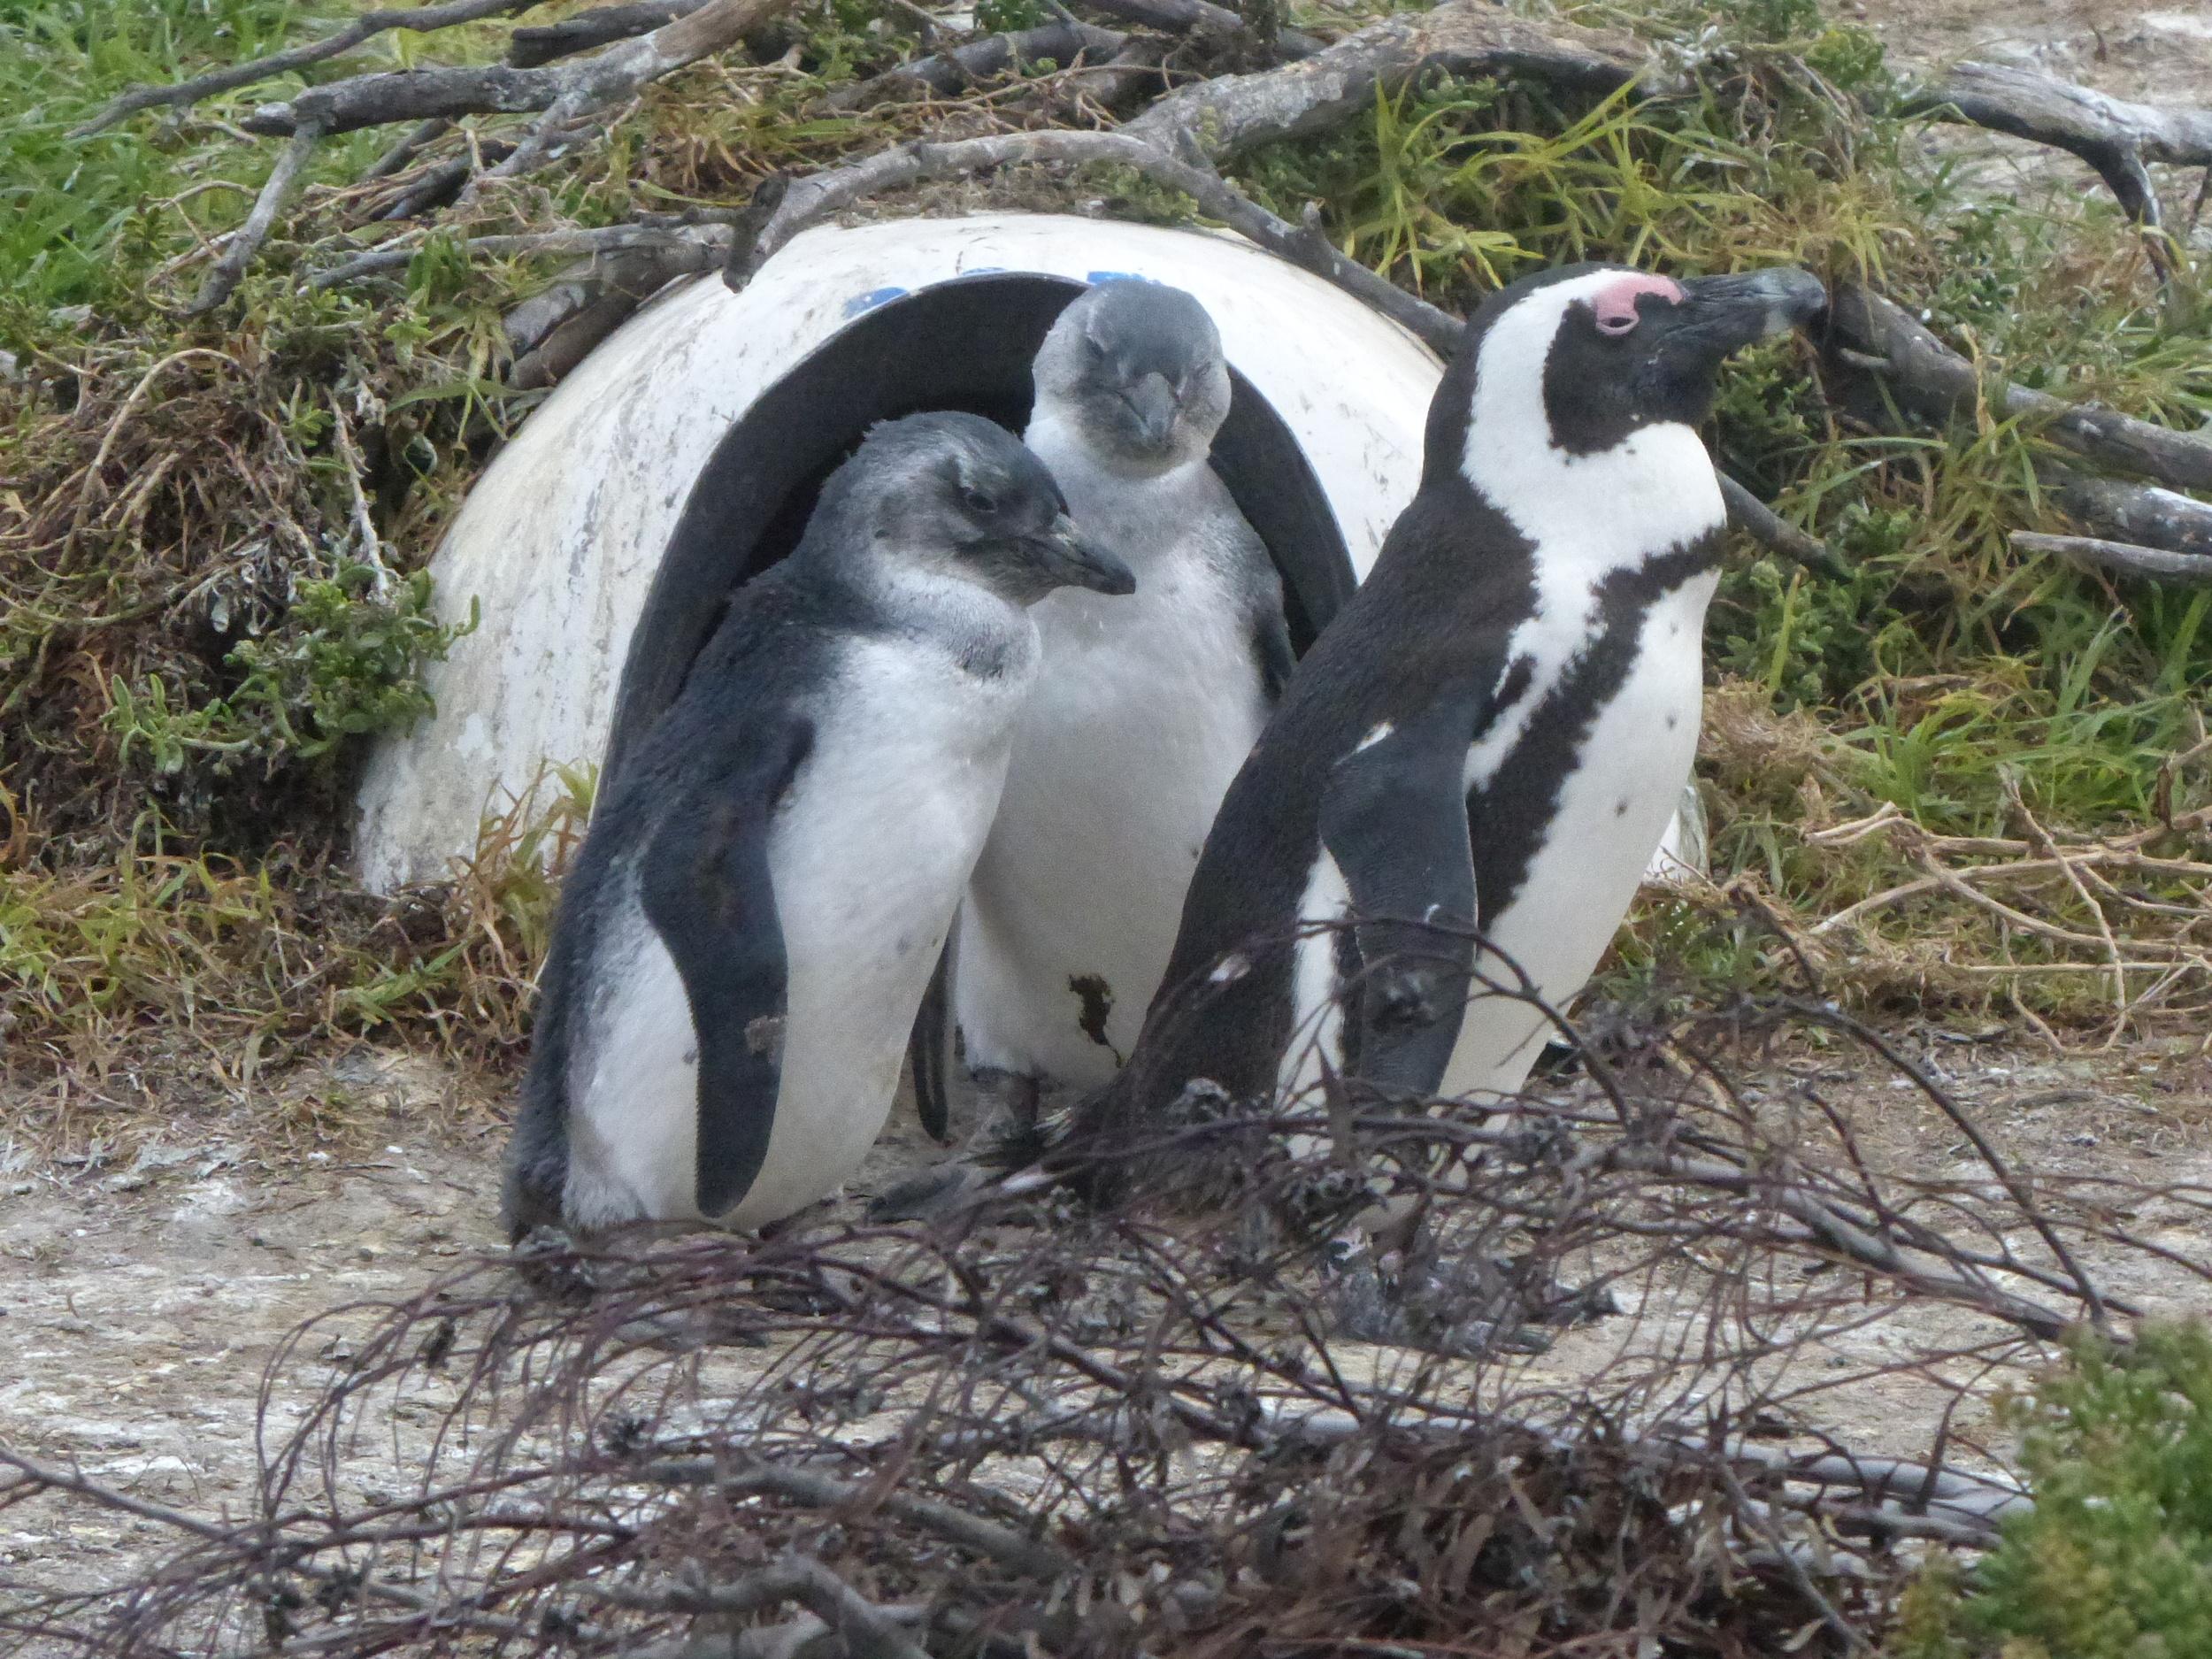 Penguin 2 chicks and artificial burrow.JPG